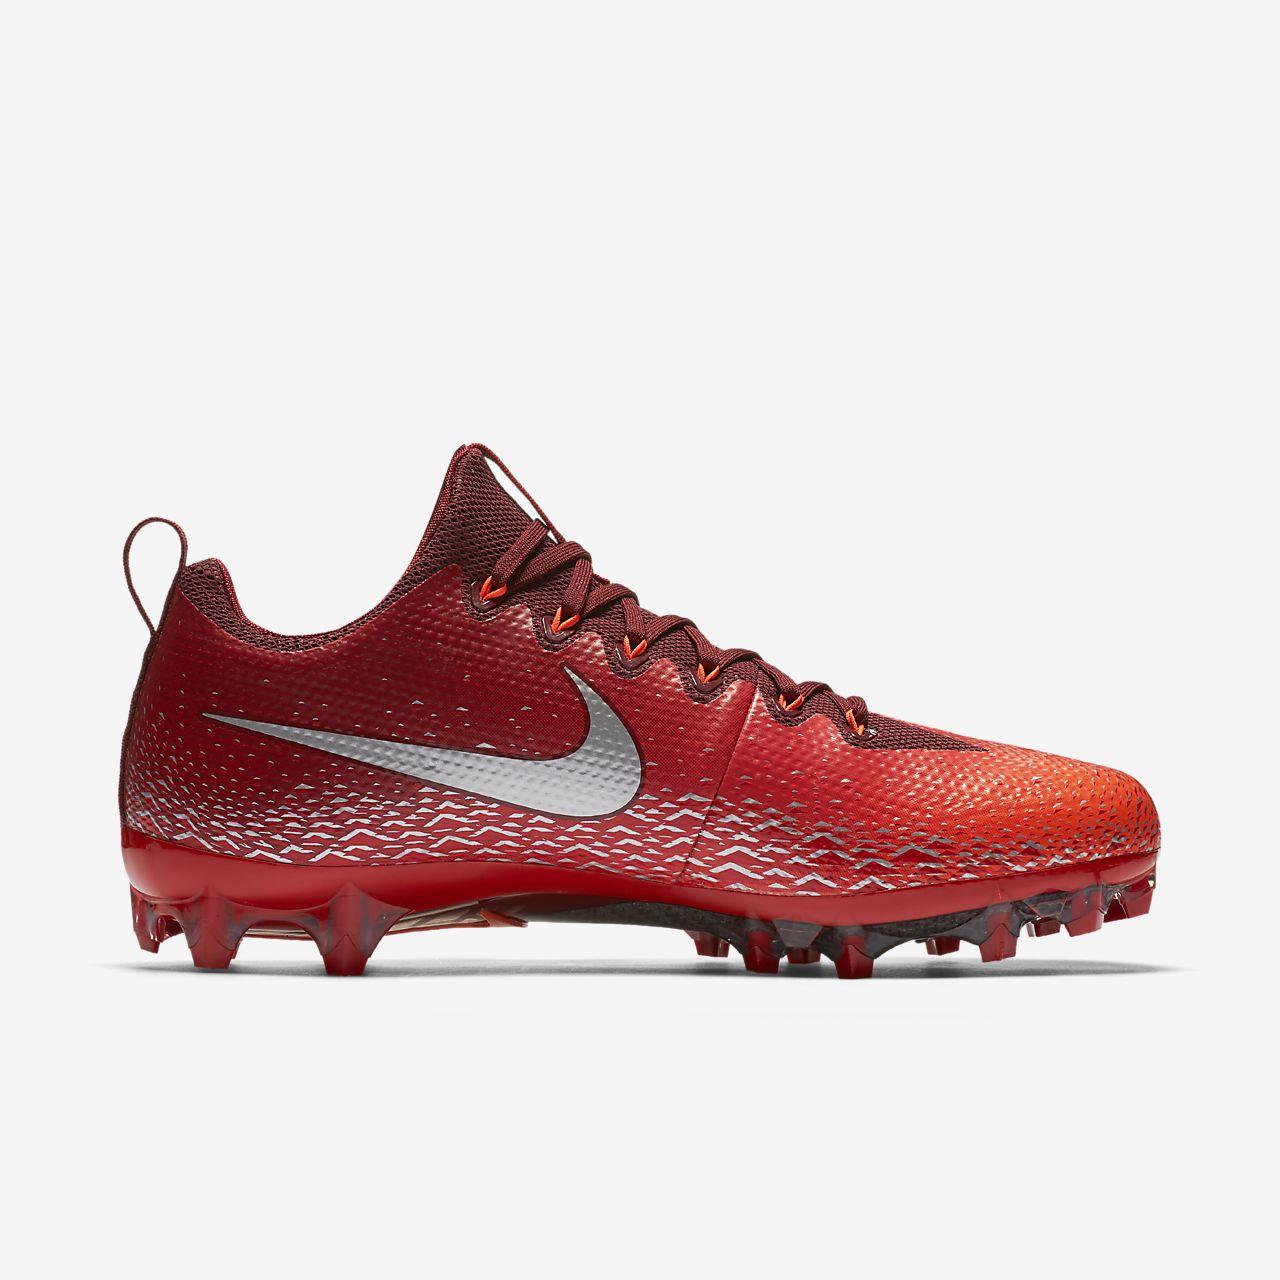 ... Nike Vapor Untouchable Pro Men's Football Cleat